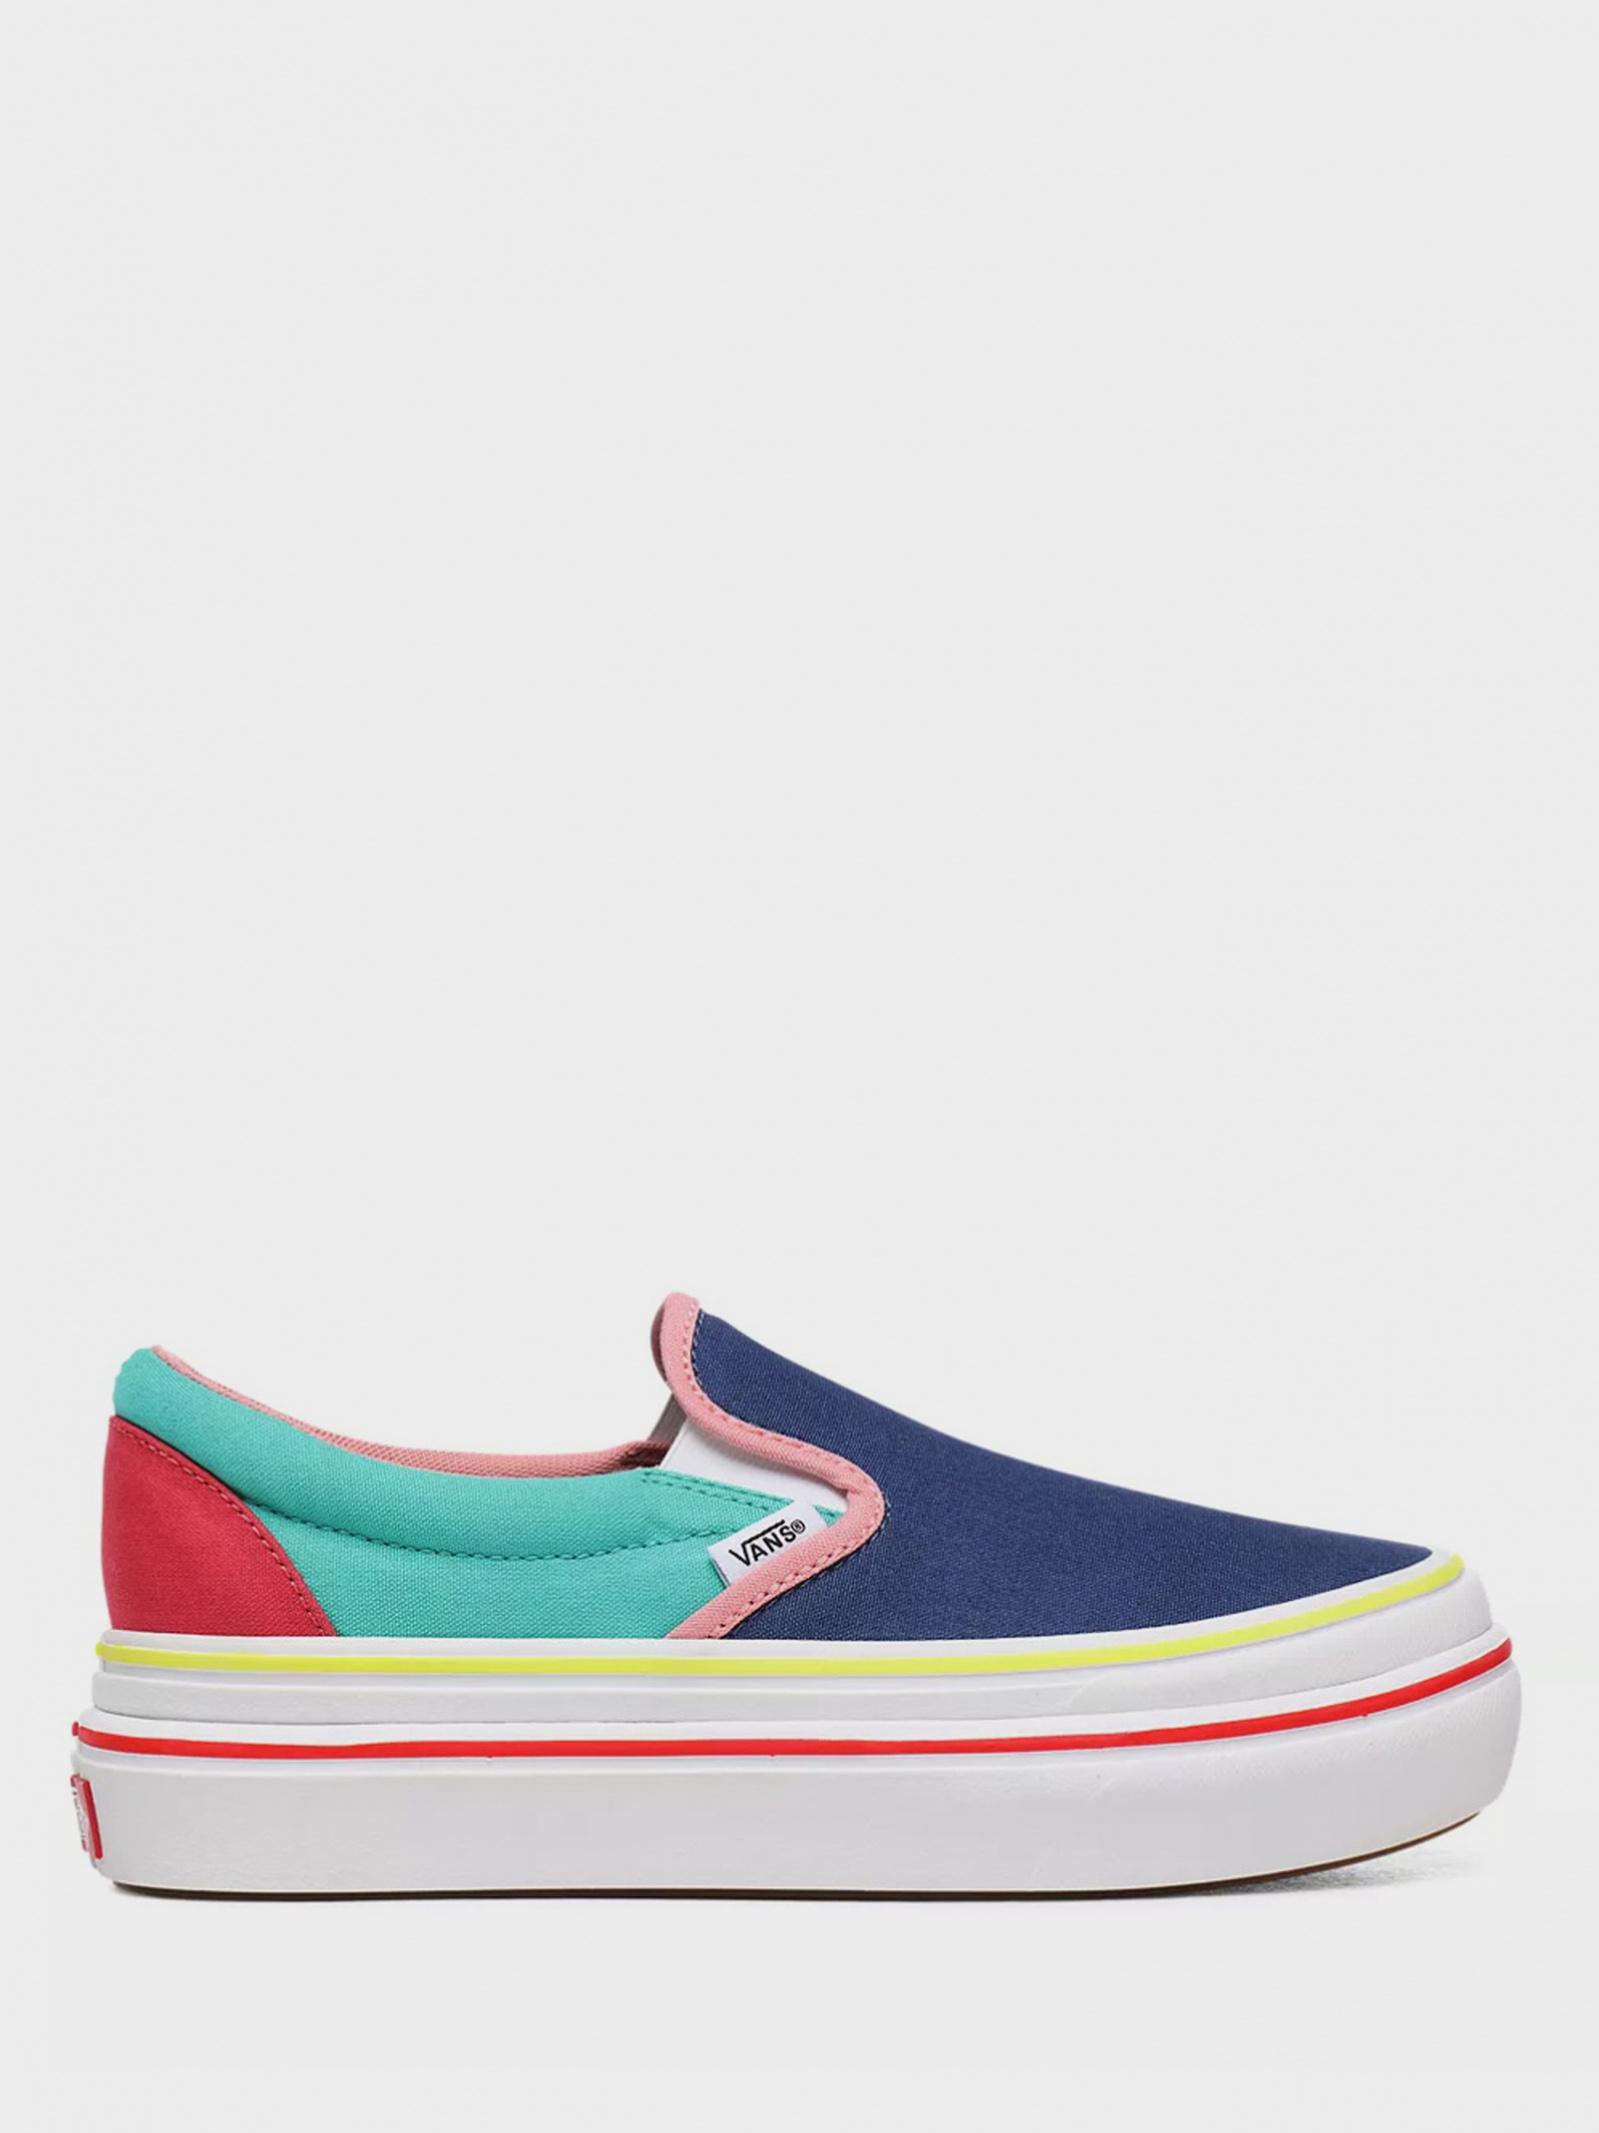 Кеди  для жінок Vans VN0A4U1FXT61 розмірна сітка взуття, 2017